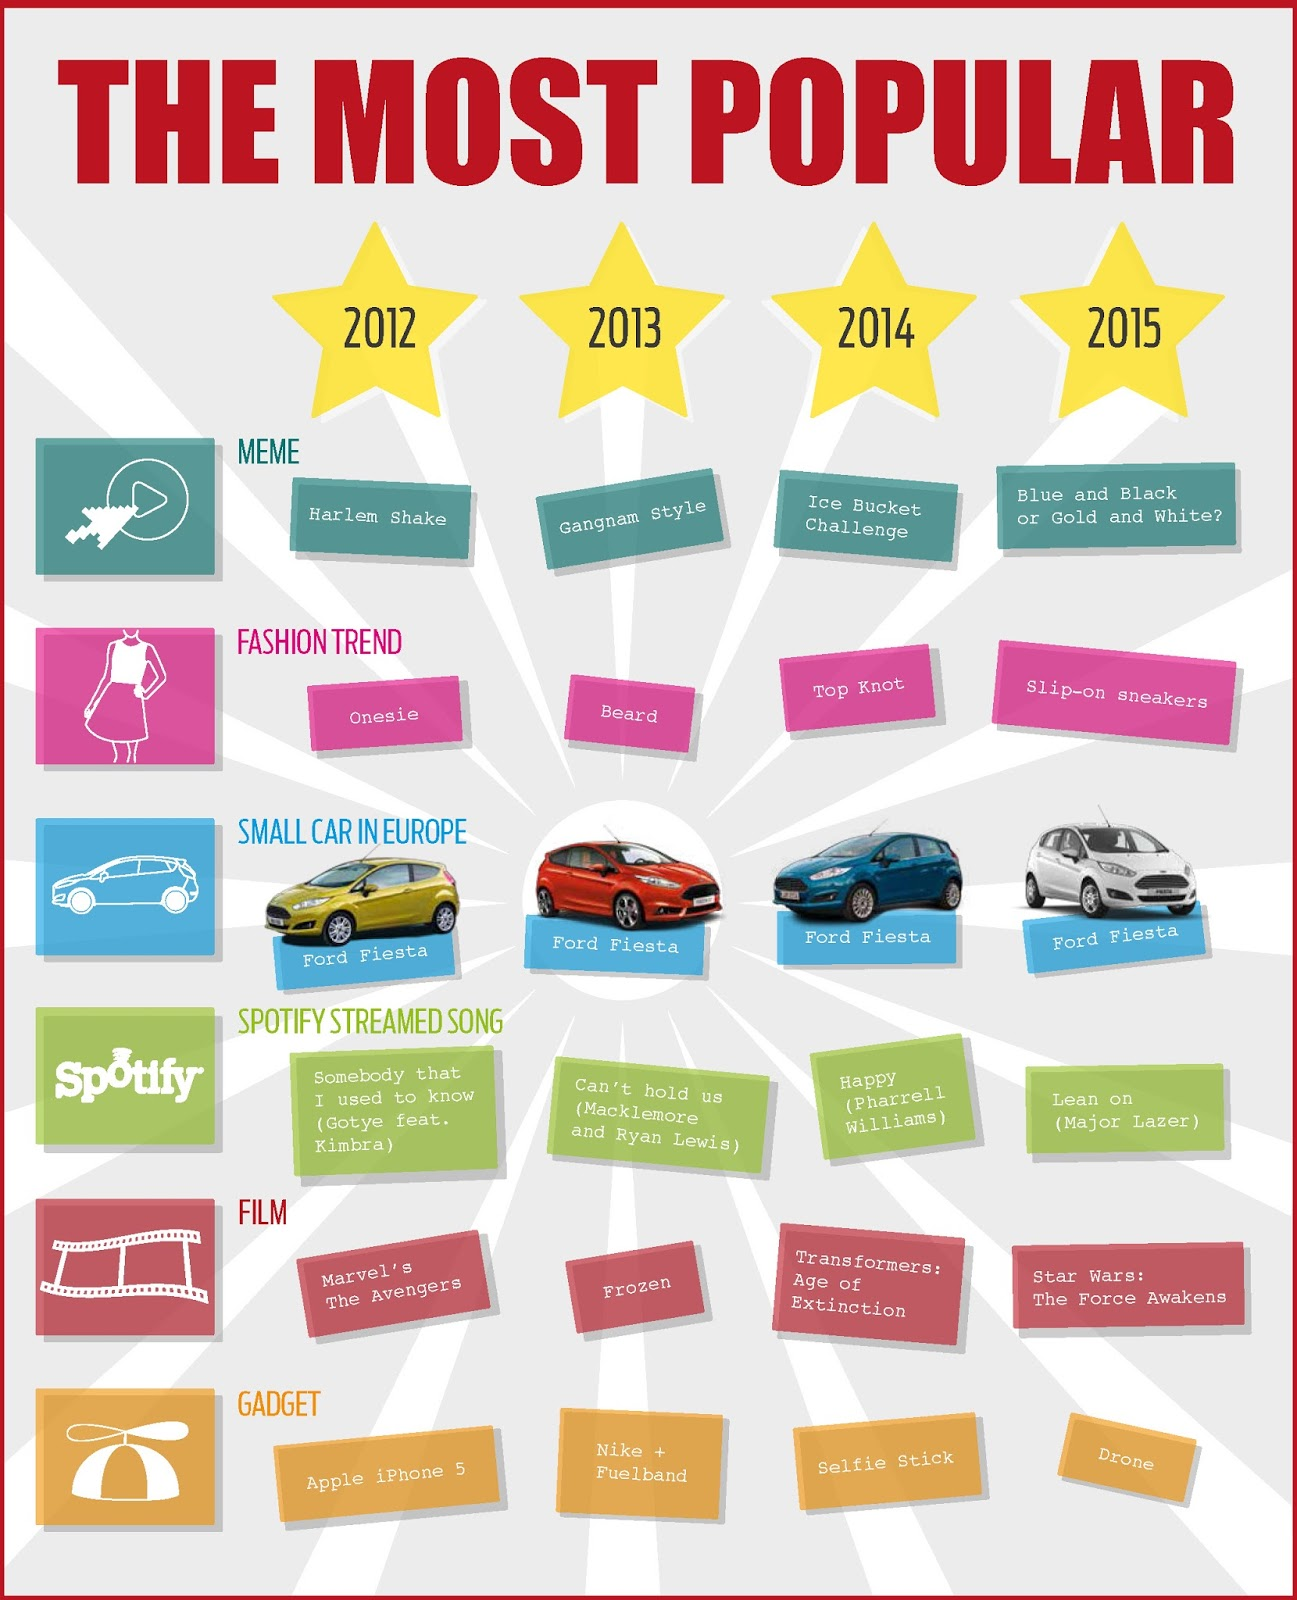 fiesta favourite small car 2015 EU Το Ford Fiesta Ευρωπαϊκό Bestseller για 4η χρονιά!